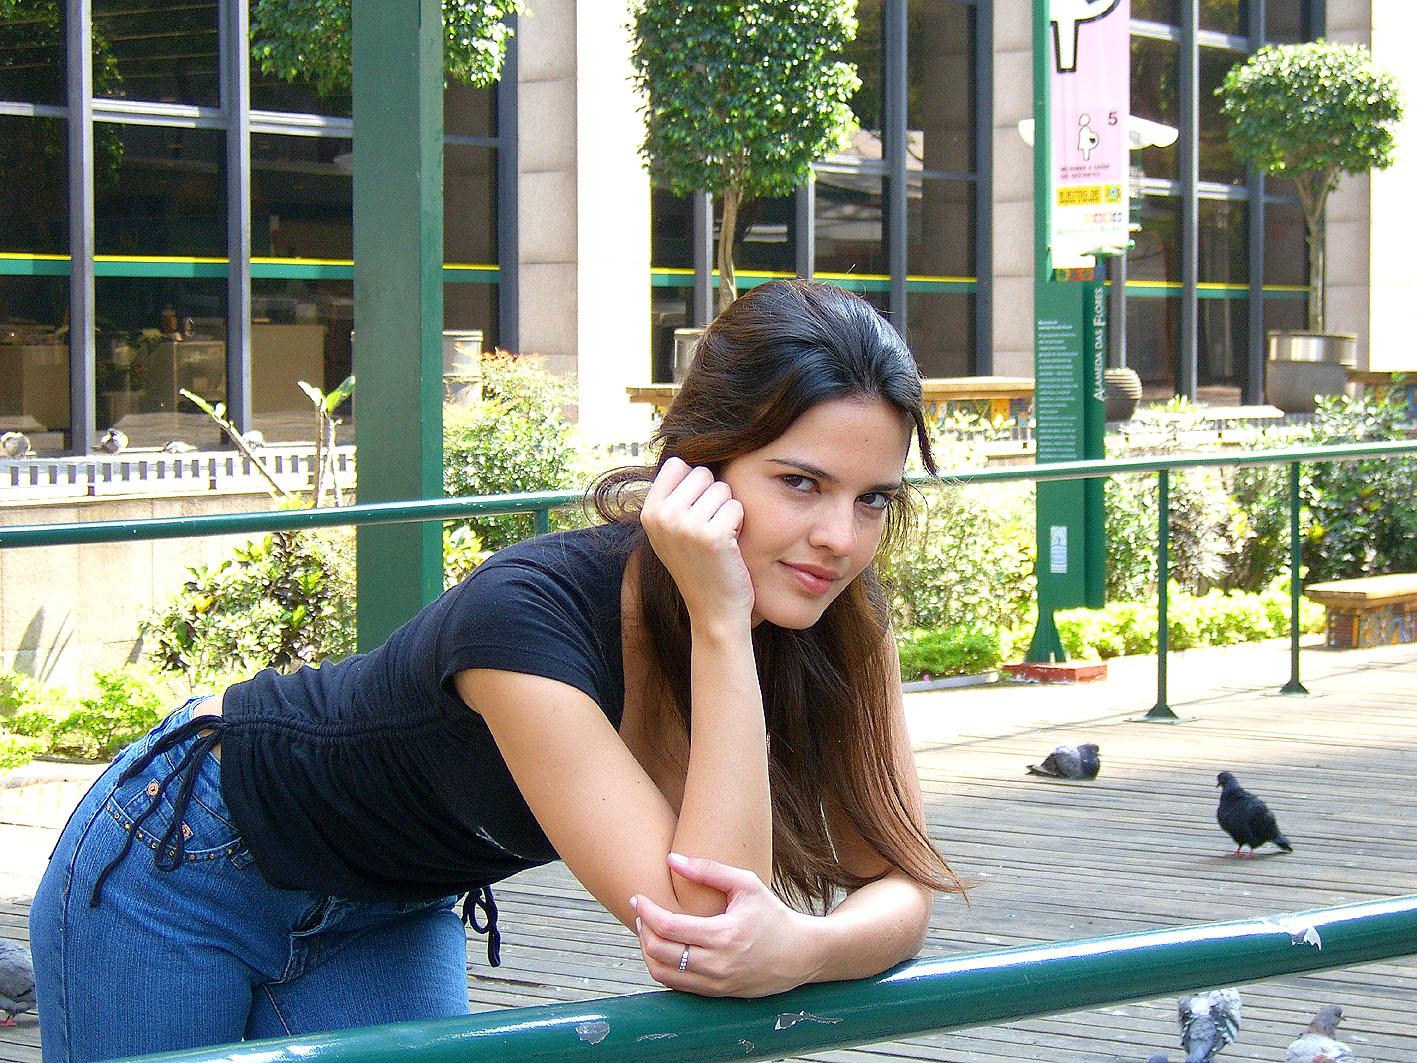 File Raquel Nunes Jpg Wikimedia Commons